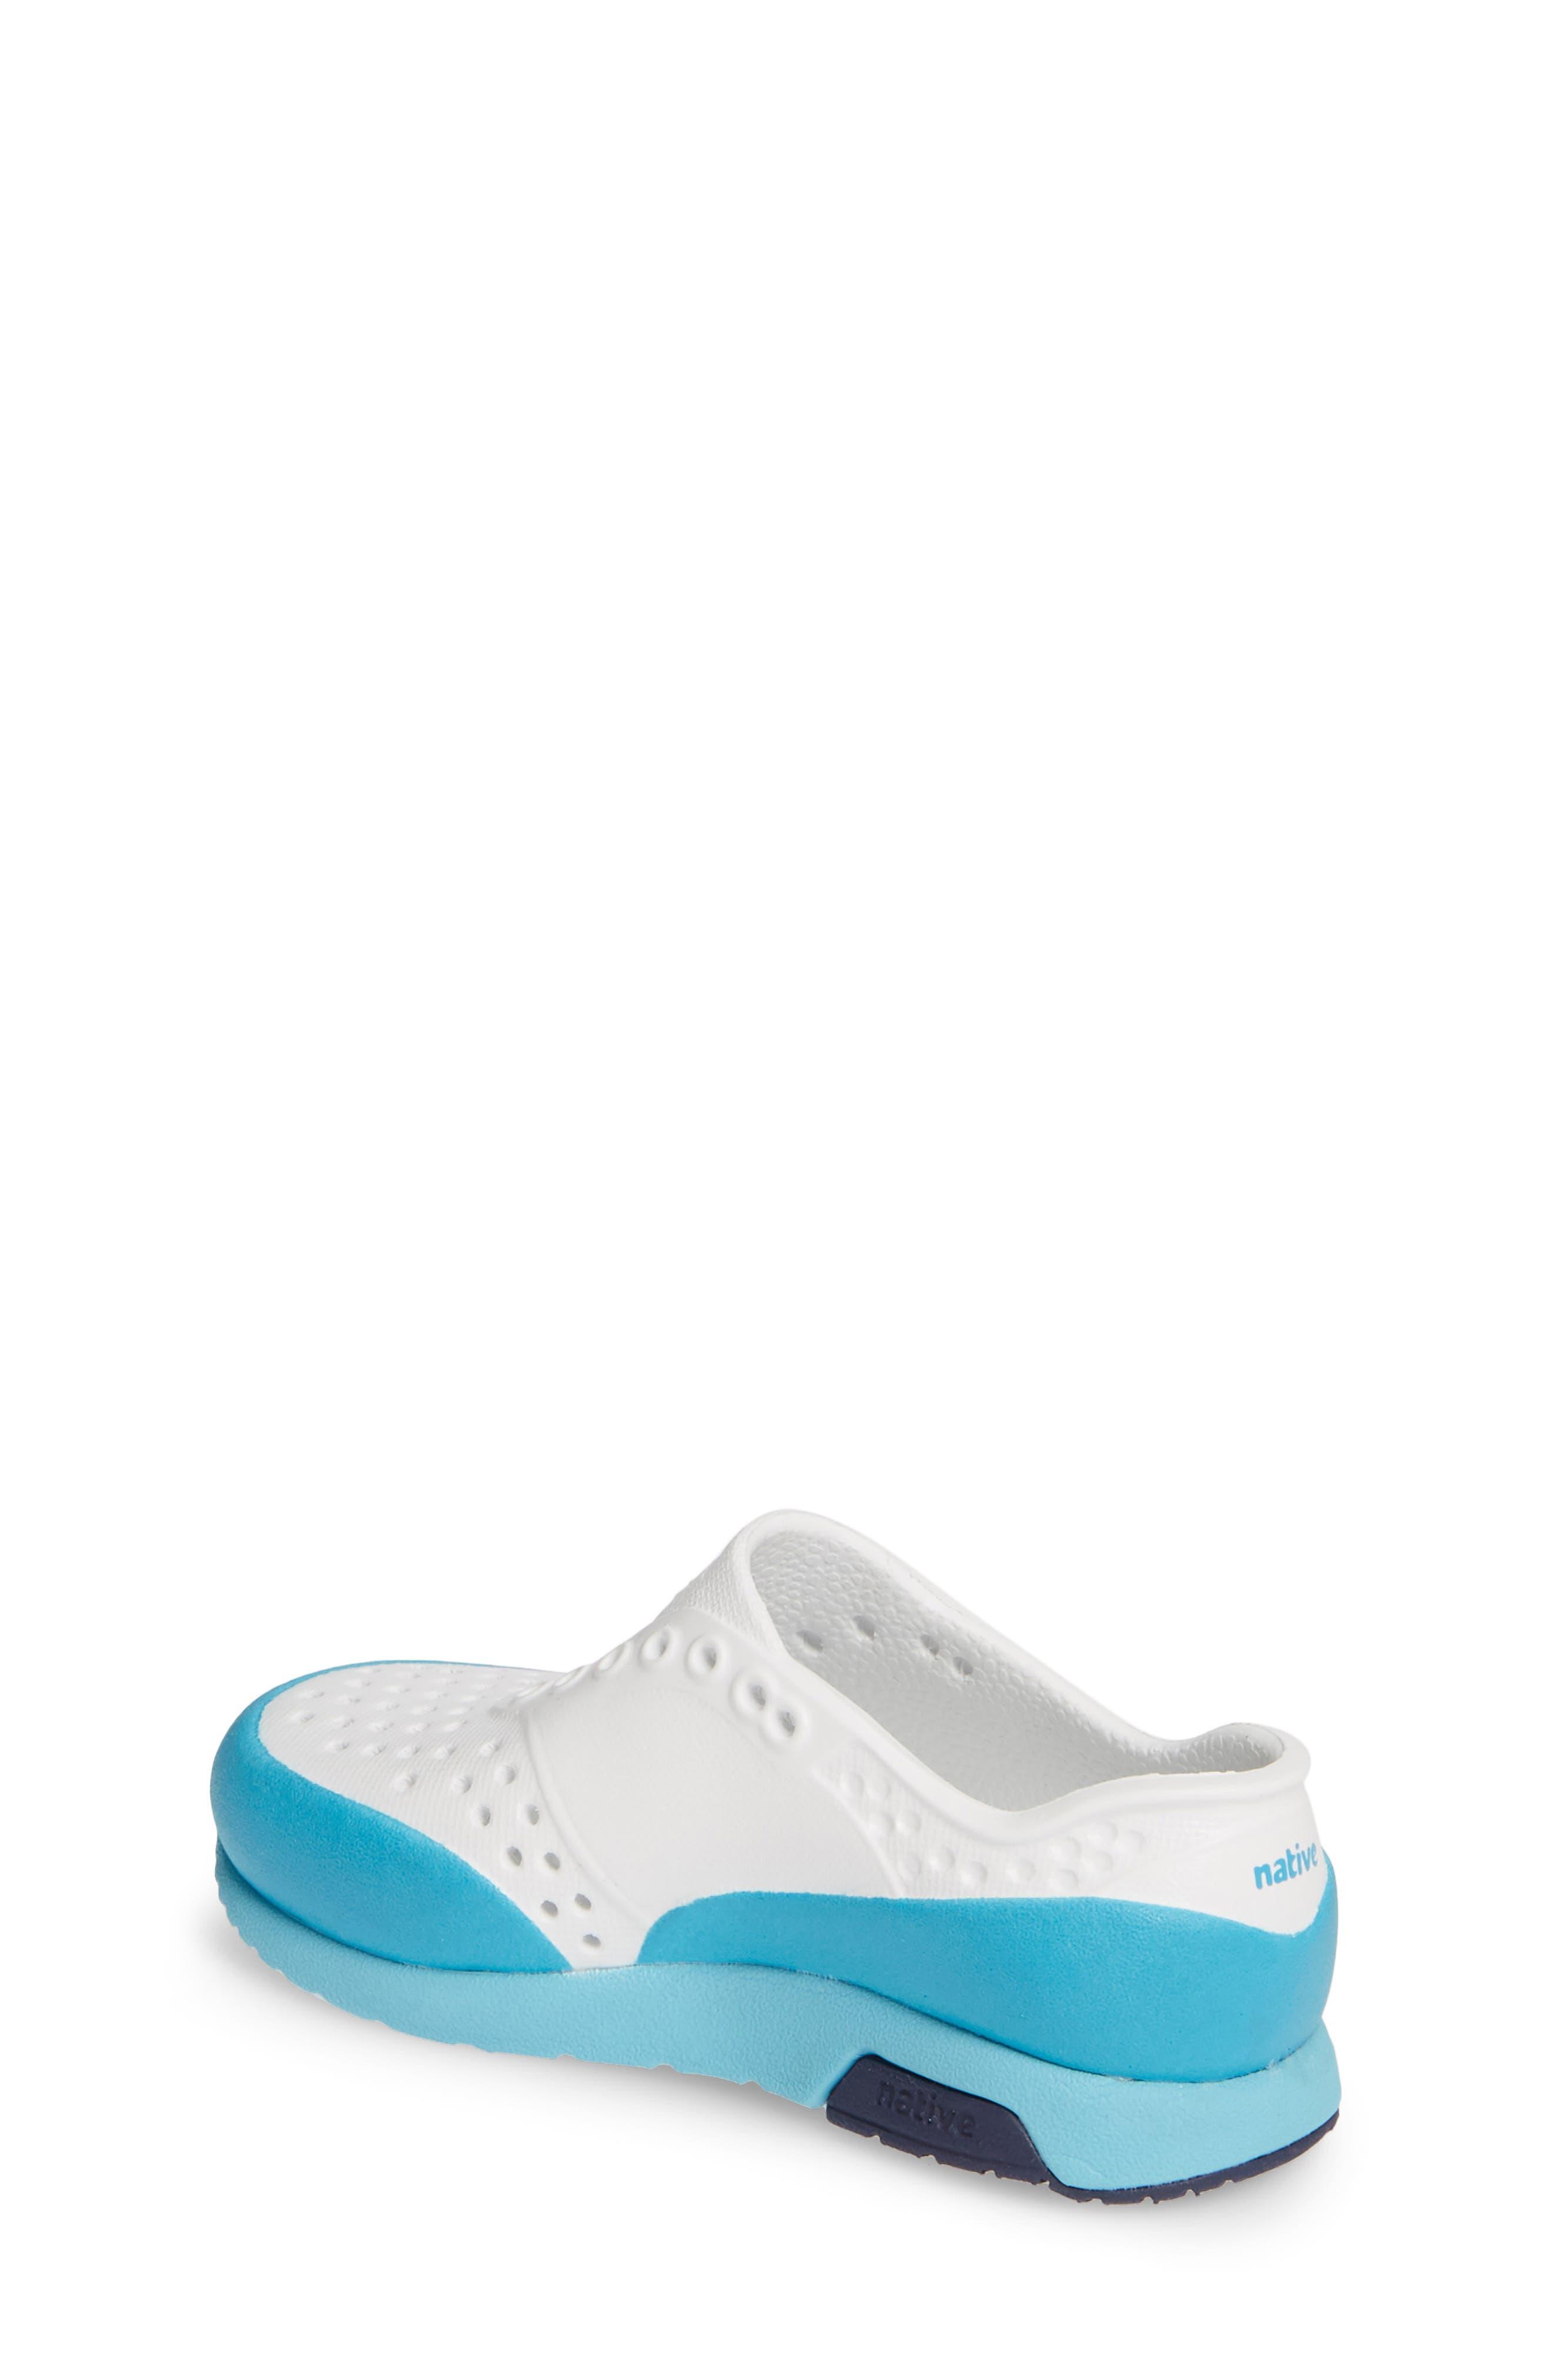 NATIVE SHOES, Lennox Block Slip-On Sneaker, Alternate thumbnail 2, color, 438